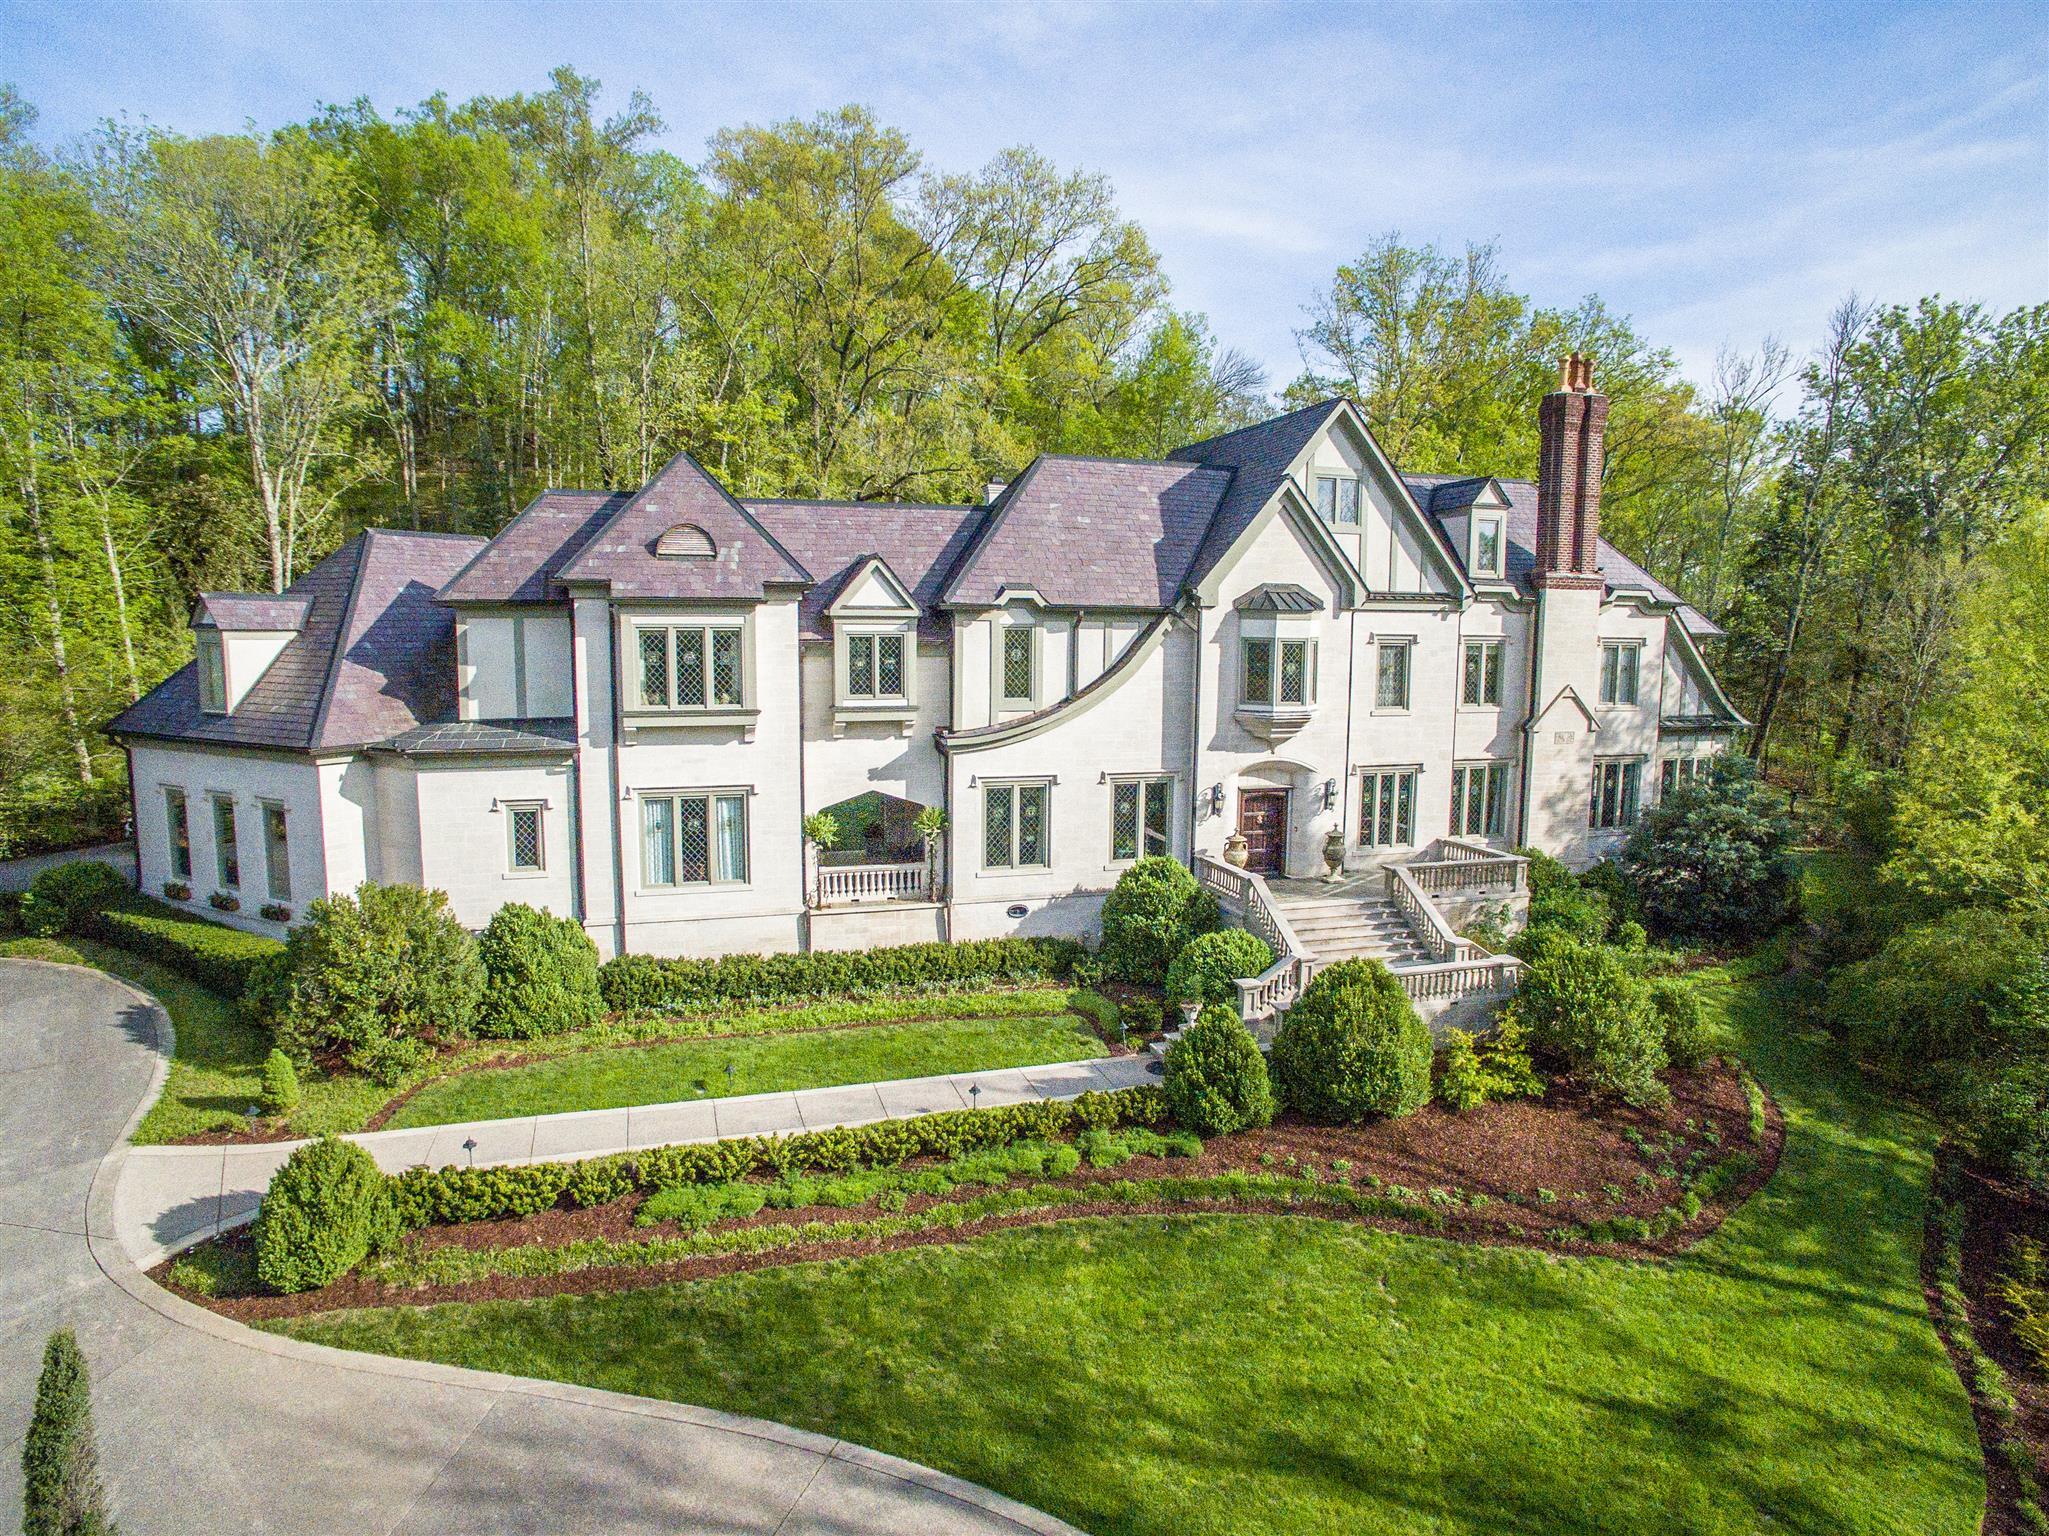 1033 Vaughn Crest Dr, Franklin, TN 37069 - Franklin, TN real estate listing